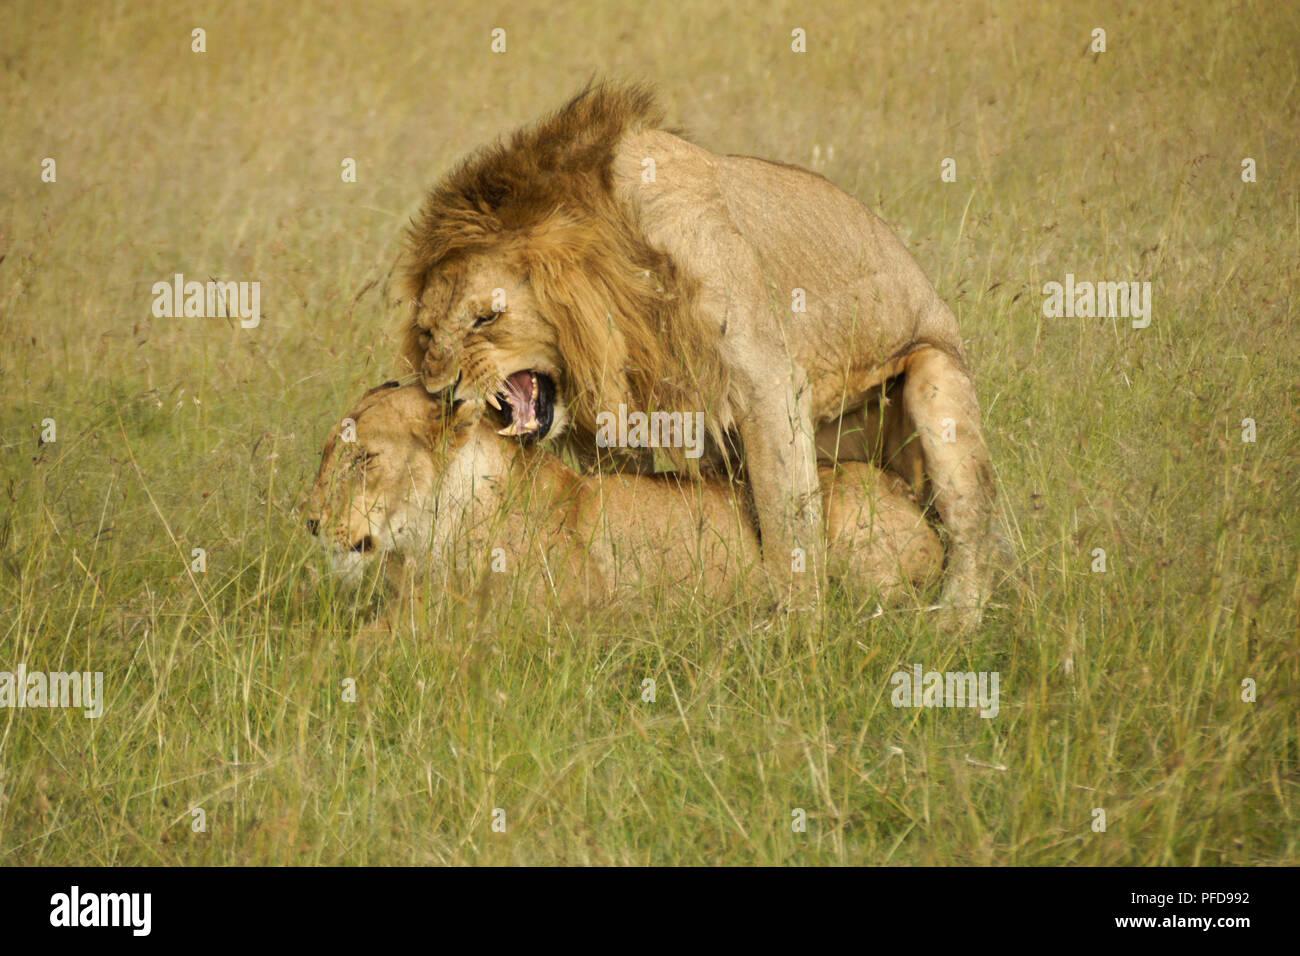 Lions mating in long grass, Masai Mara Game Reserve, Kenya - Stock Image